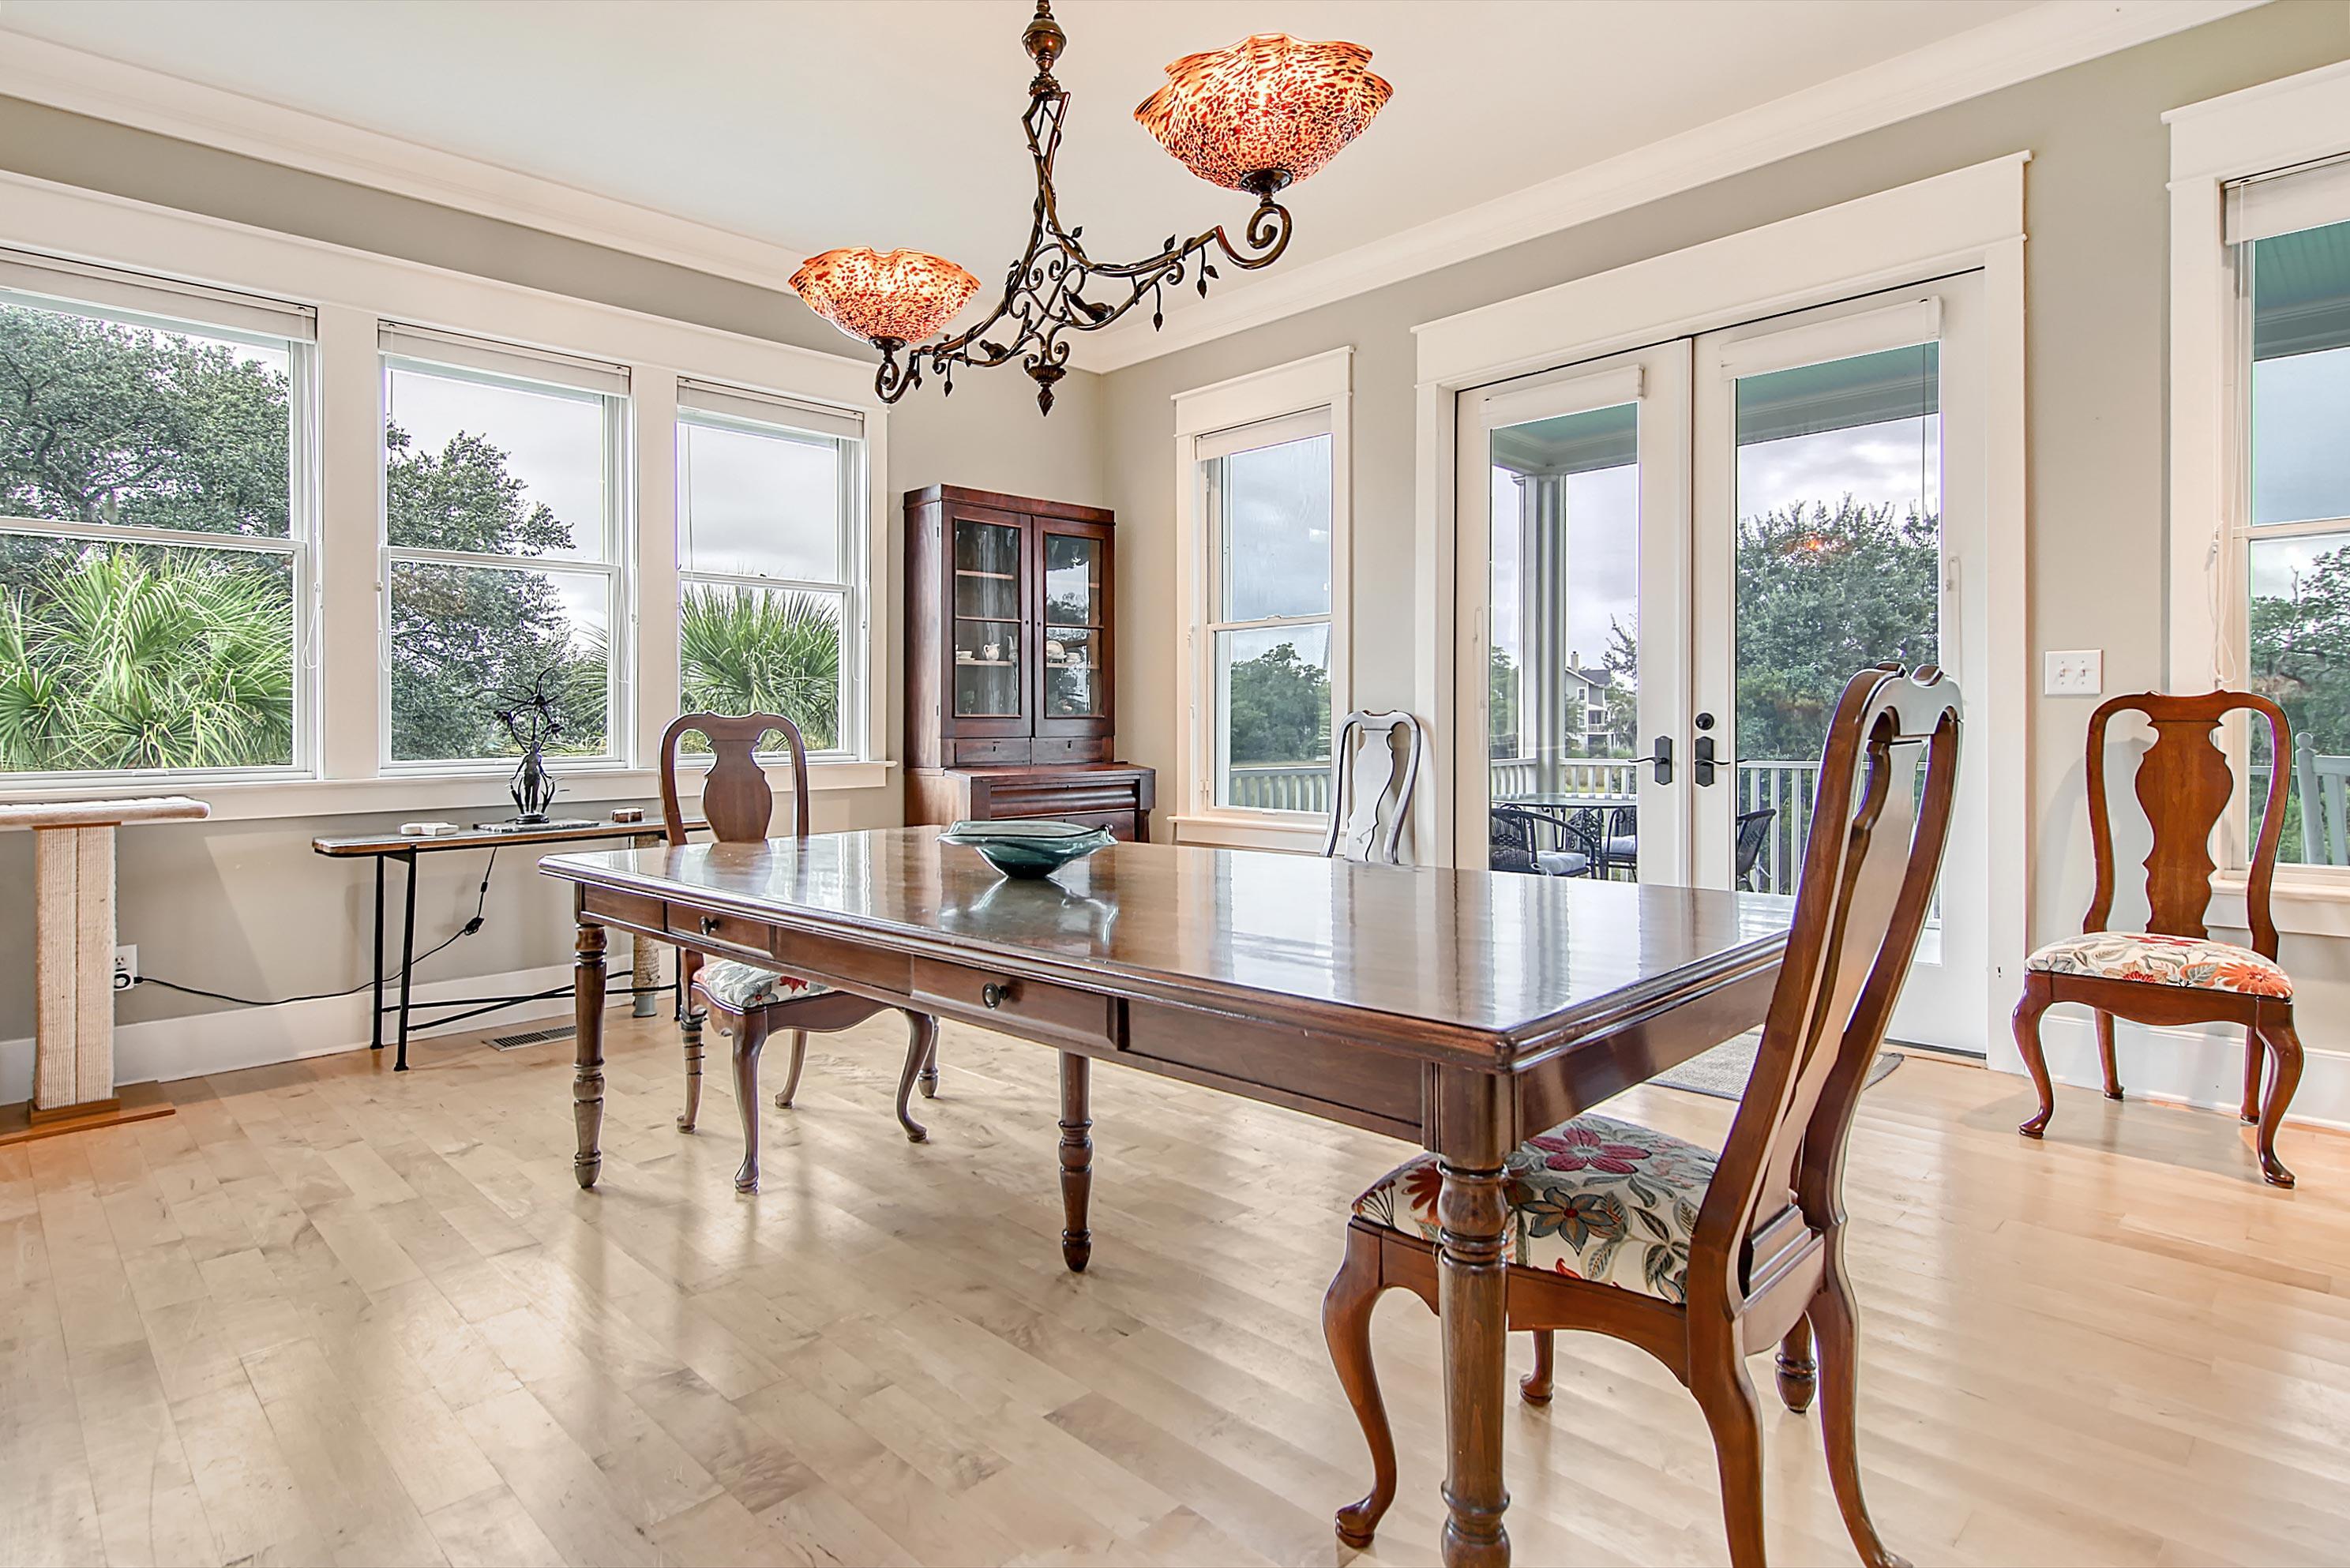 Scanlonville Homes For Sale - 152 6th, Mount Pleasant, SC - 7